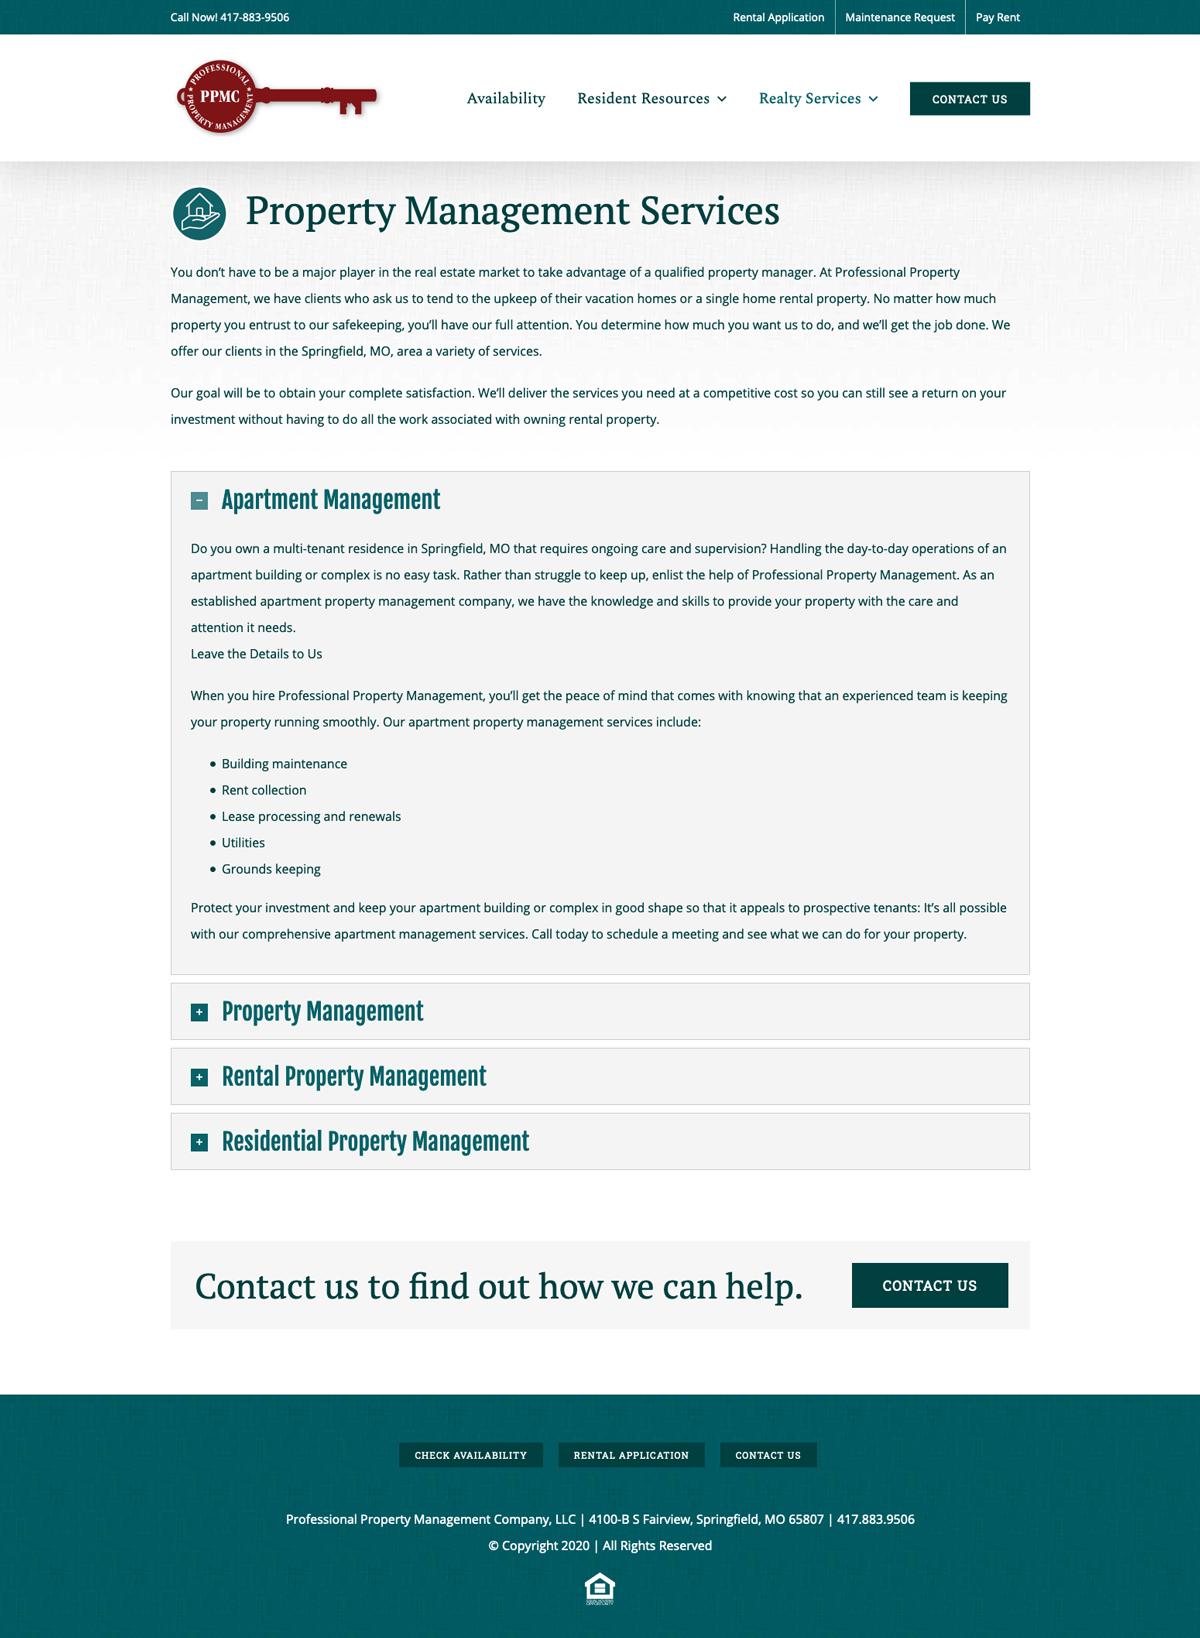 Customer Management System (CMS) Website Design for Professional Property Management Company